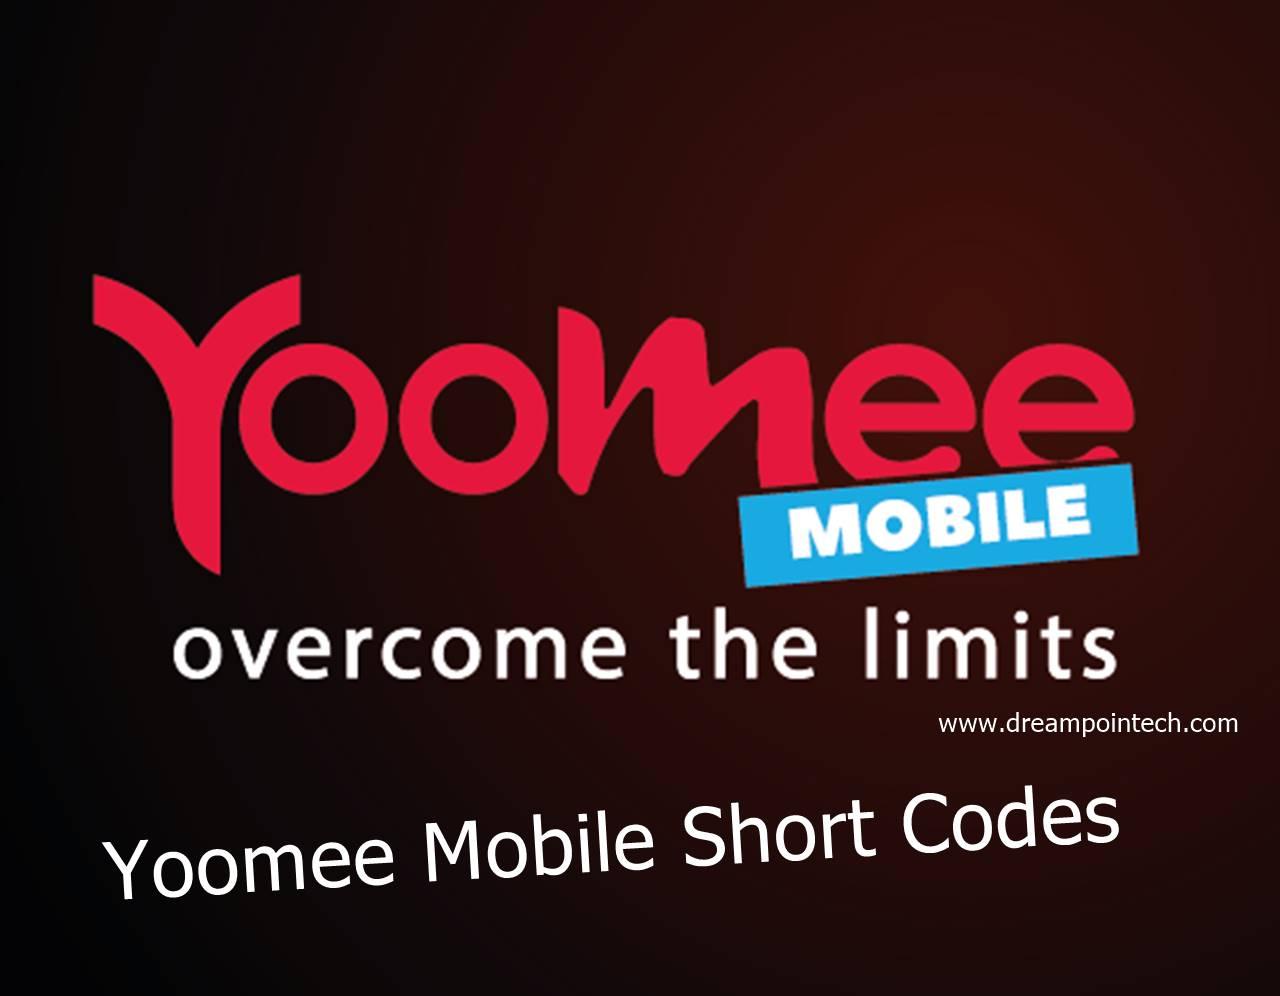 Yoomee Mobile Short Codes